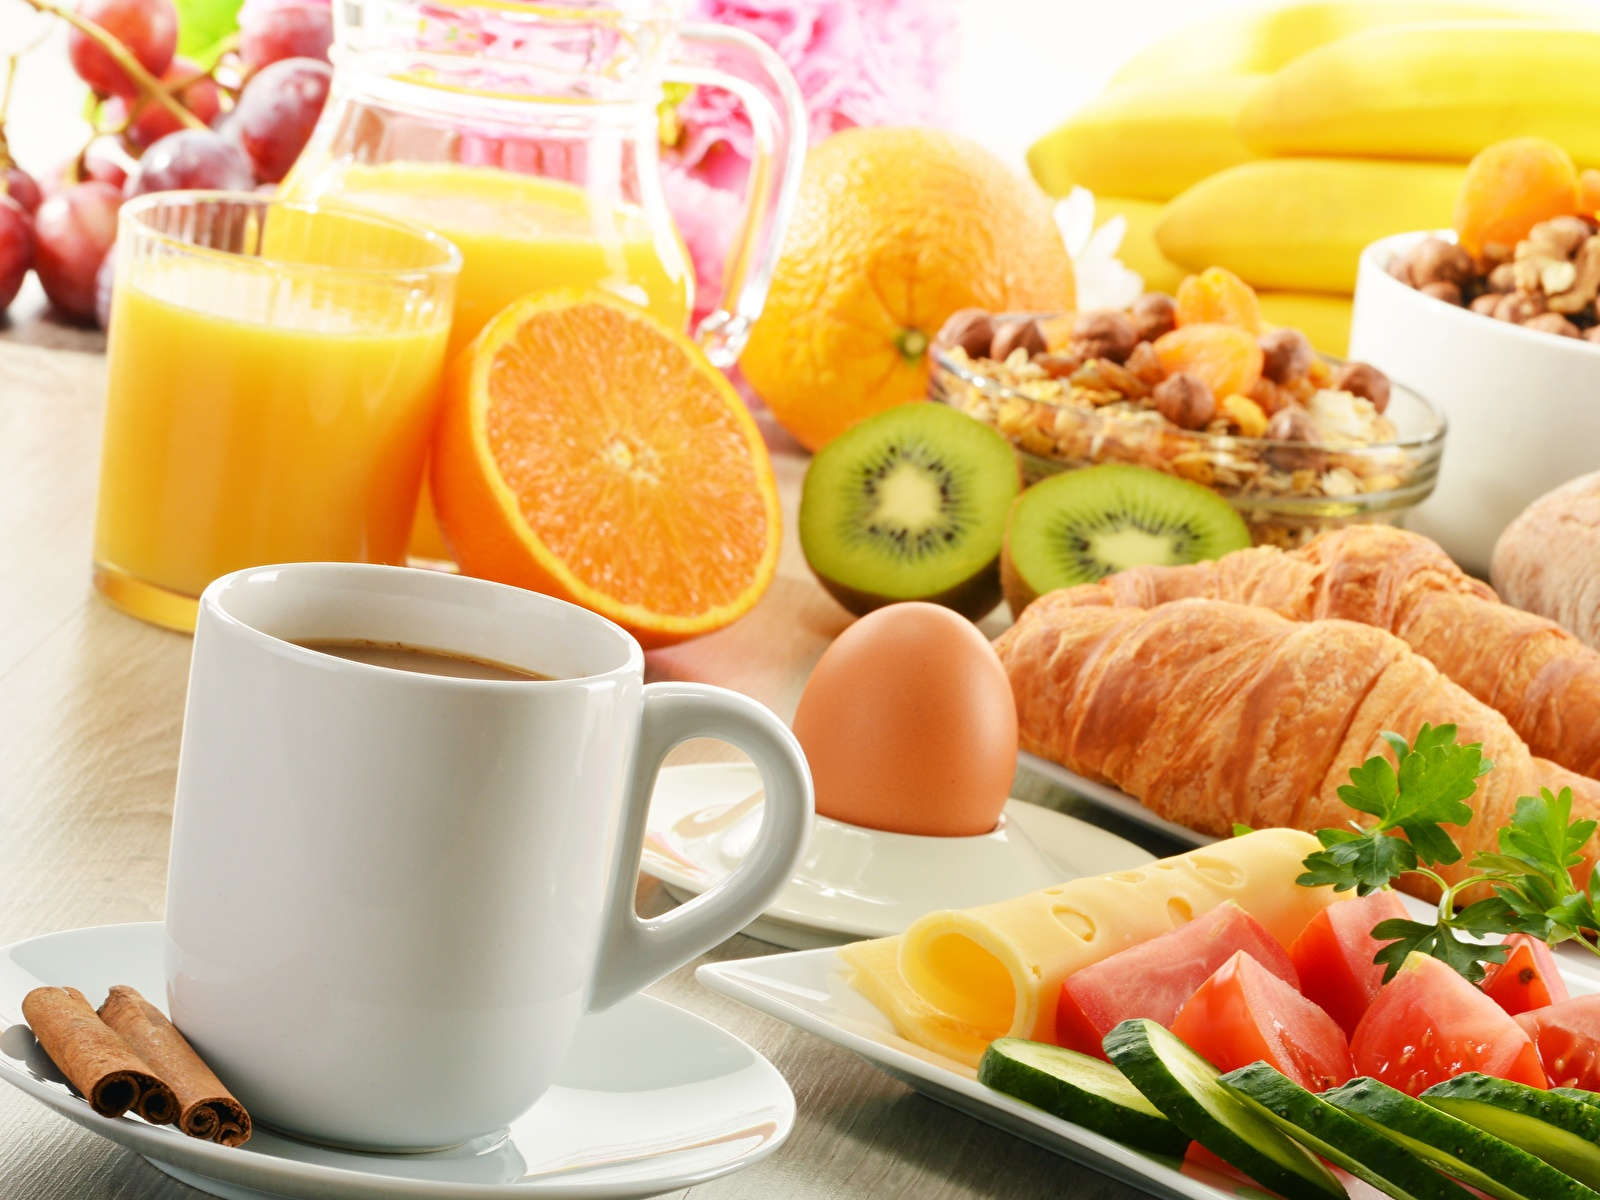 еда апельсин сок food orange juice  № 613558 бесплатно